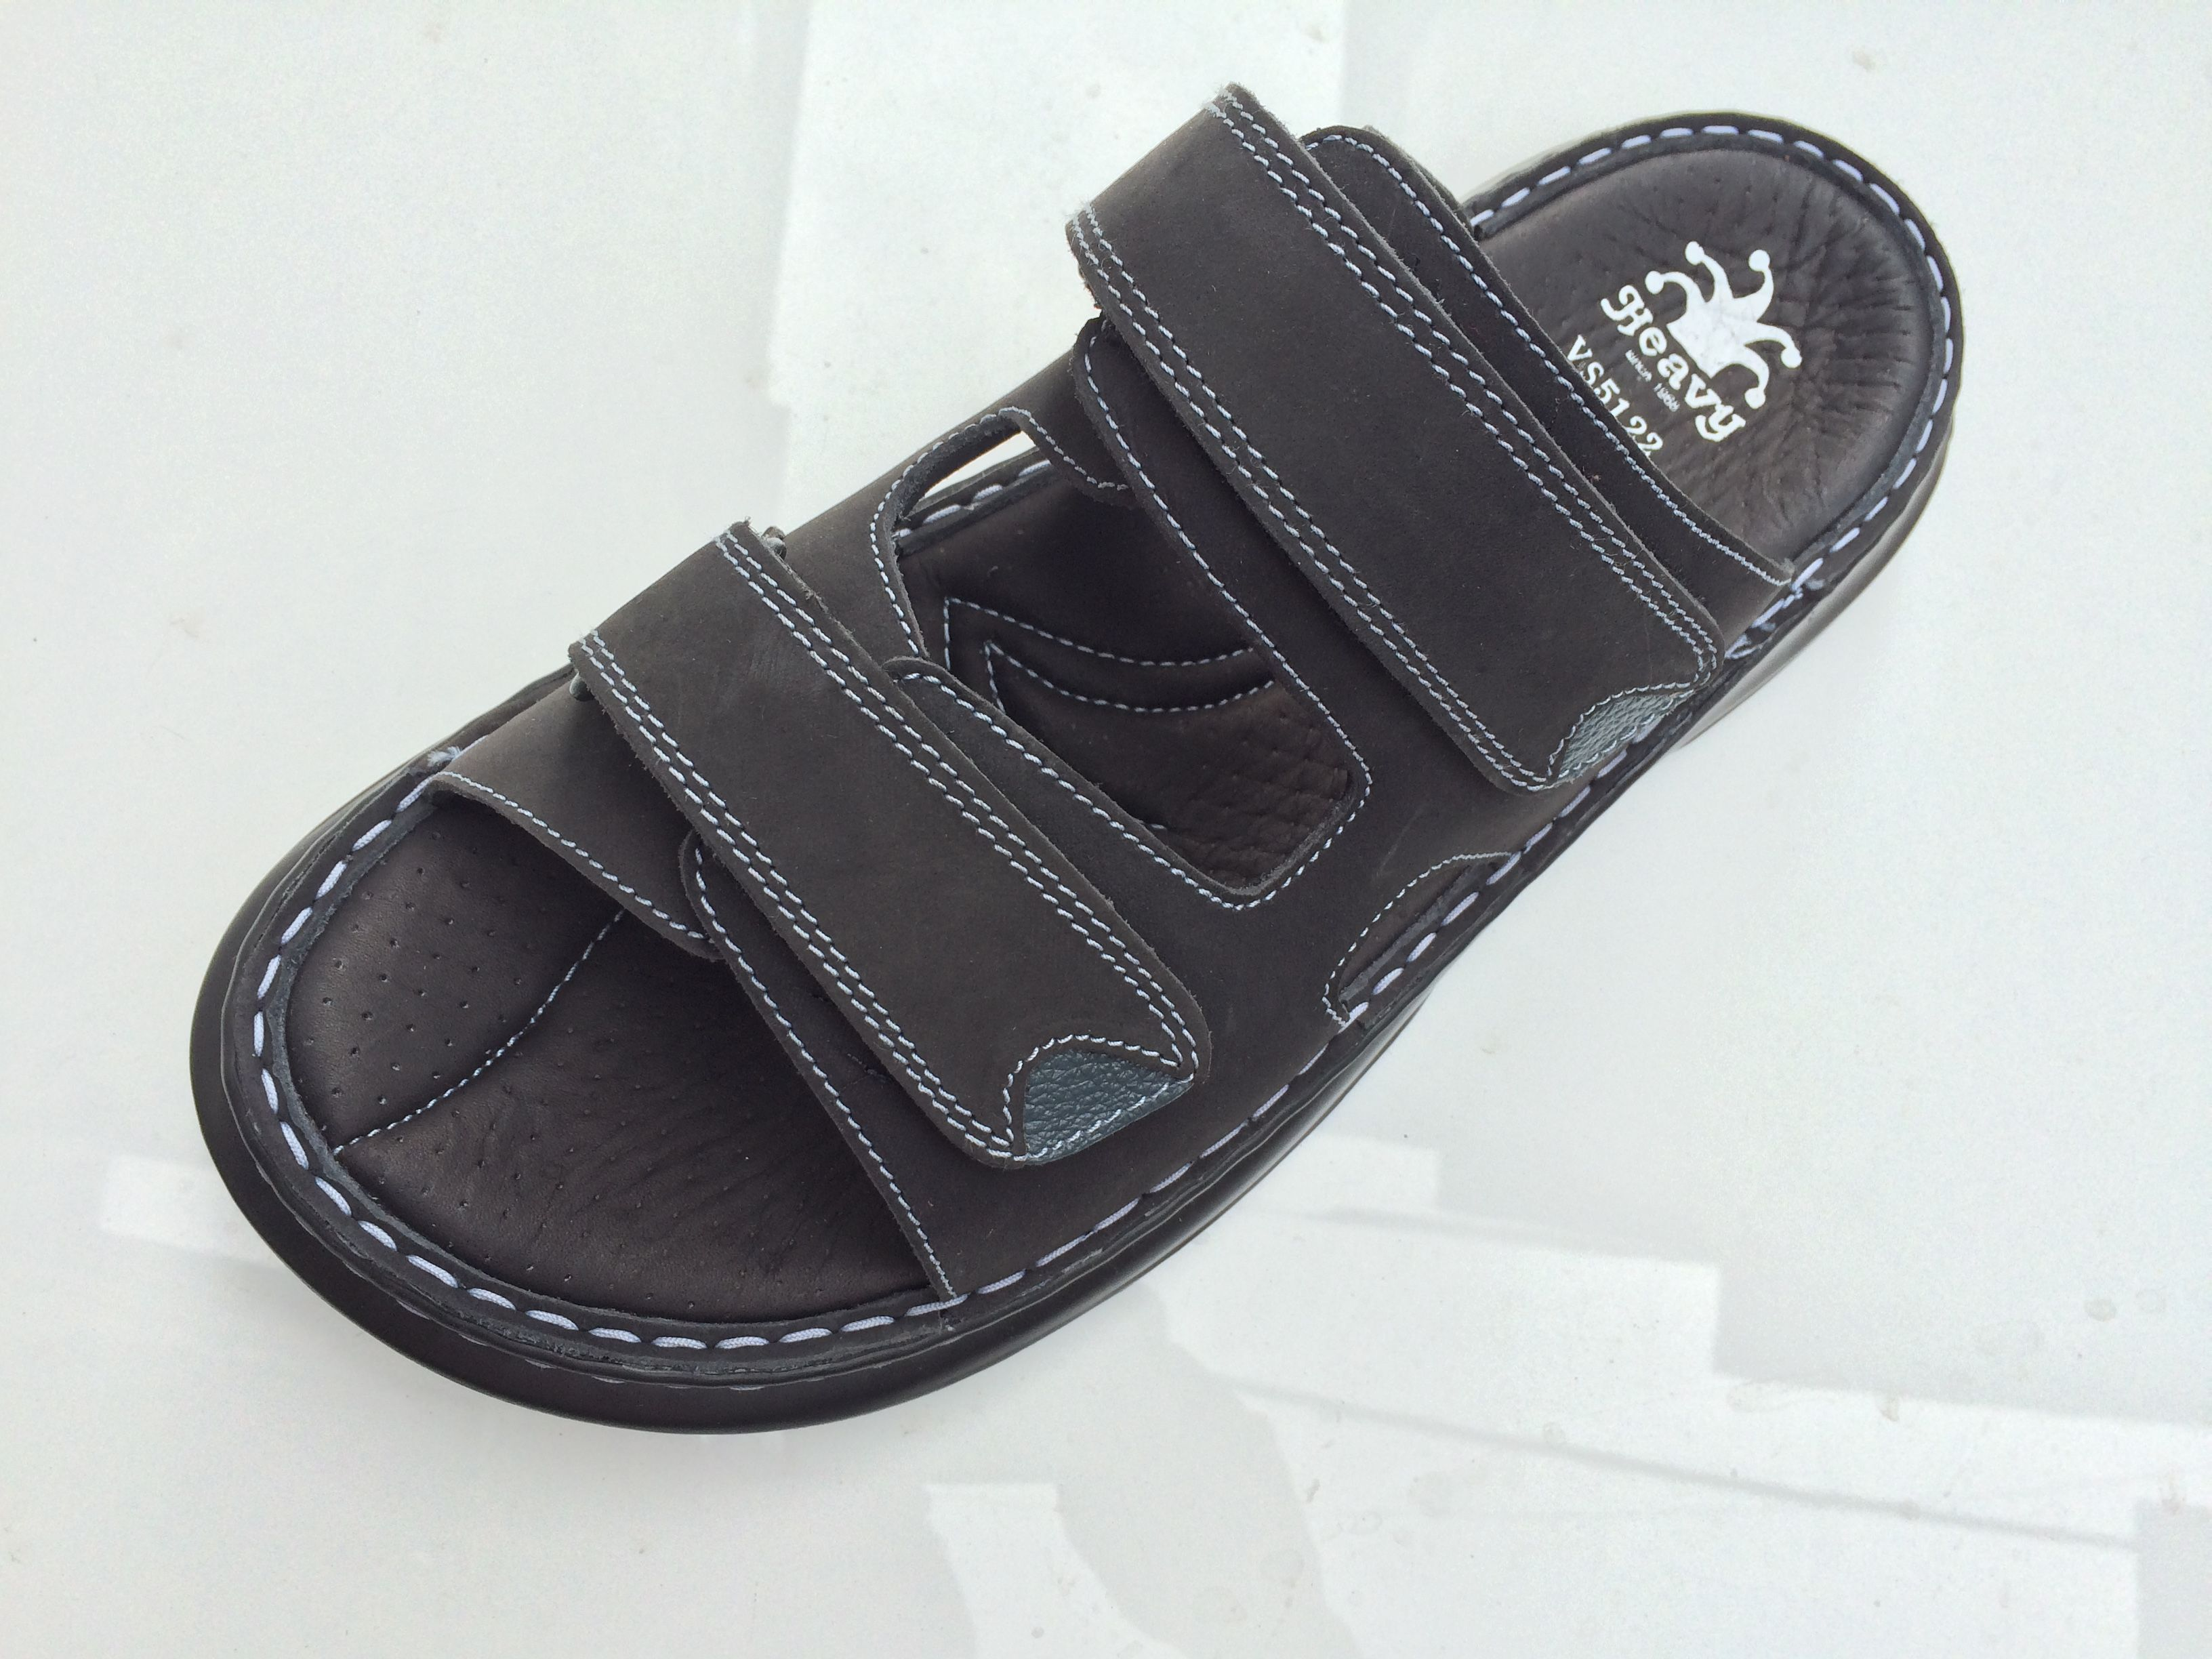 6362aa677b75 Pin by Nisa Wonan on รองเท้าแตะ